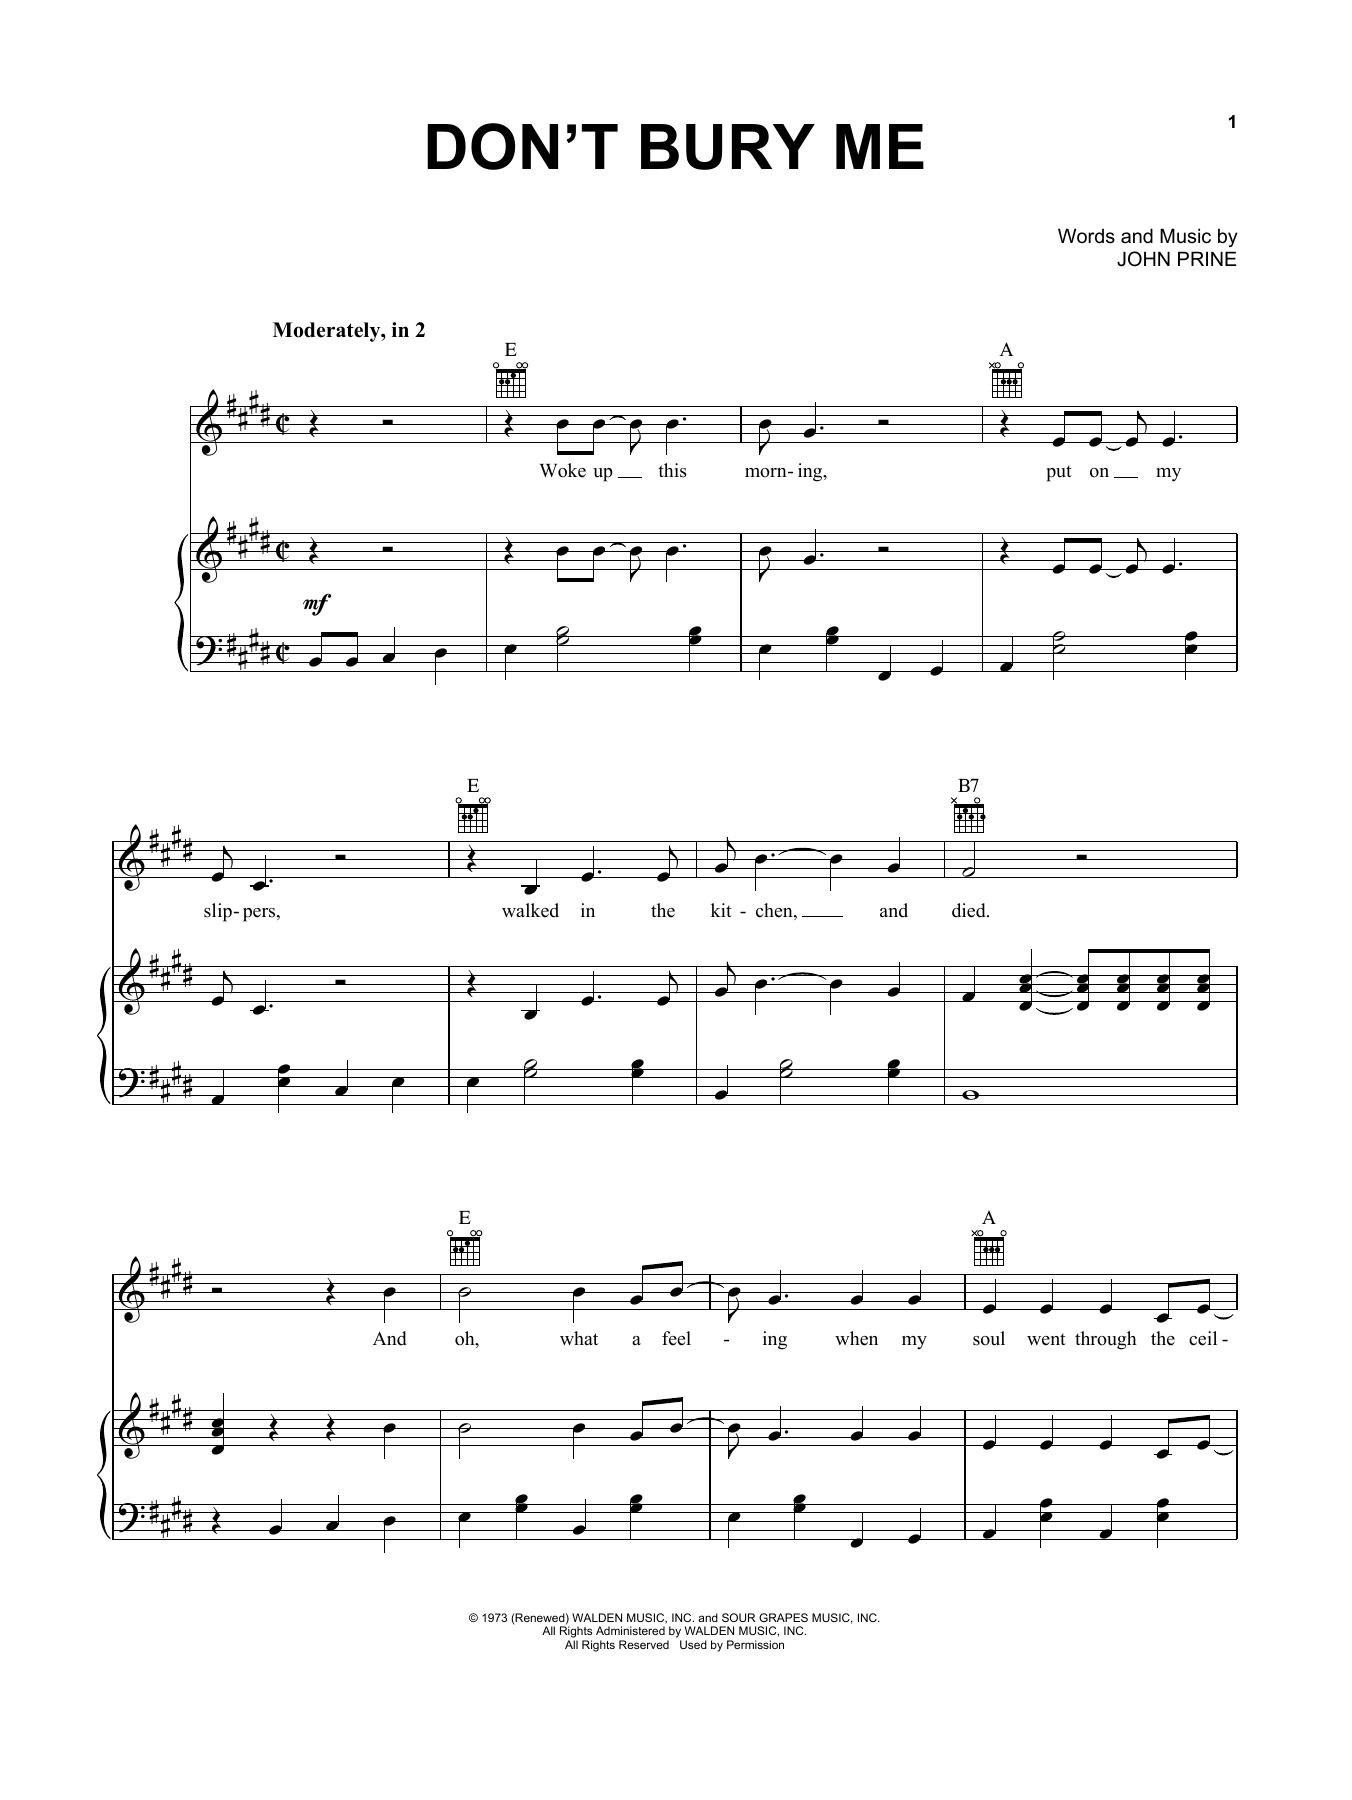 John Prine 'Don't Bury Me' Sheet Music Notes, Chords   Download Printable  Piano, Vocal & Guitar Right Hand Melody   SKU 15